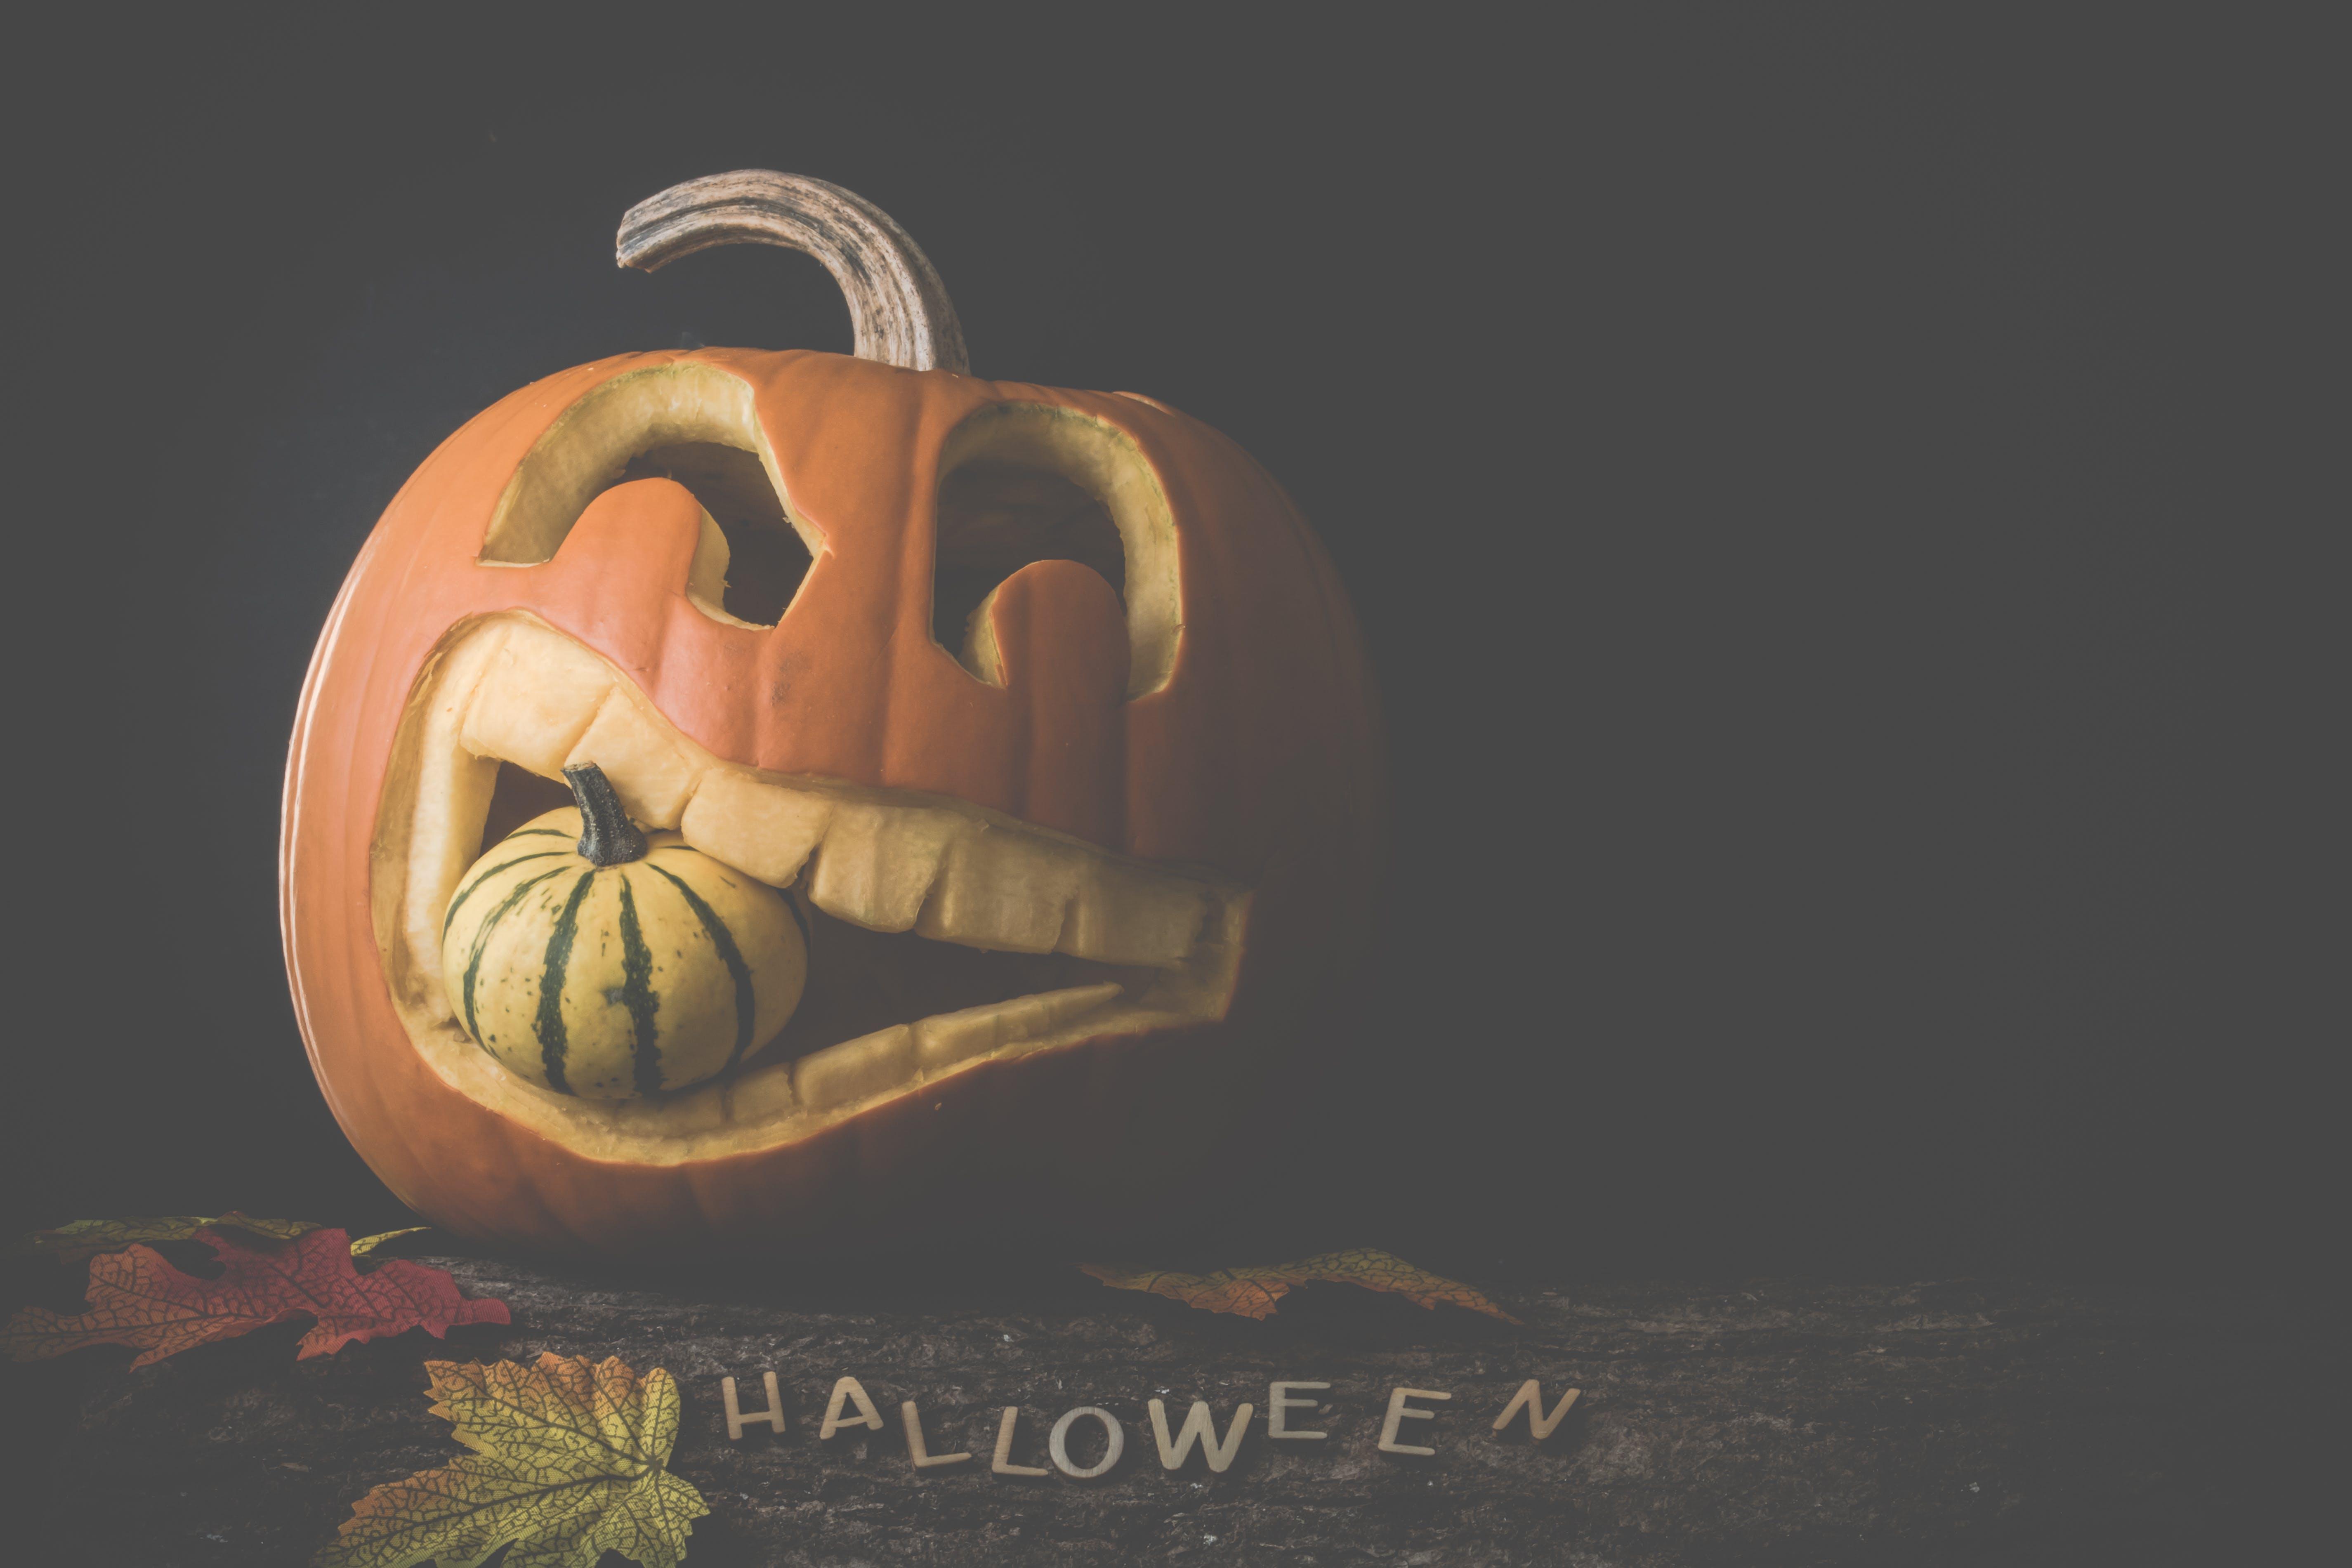 Jack-o-lantern Halloween Decor